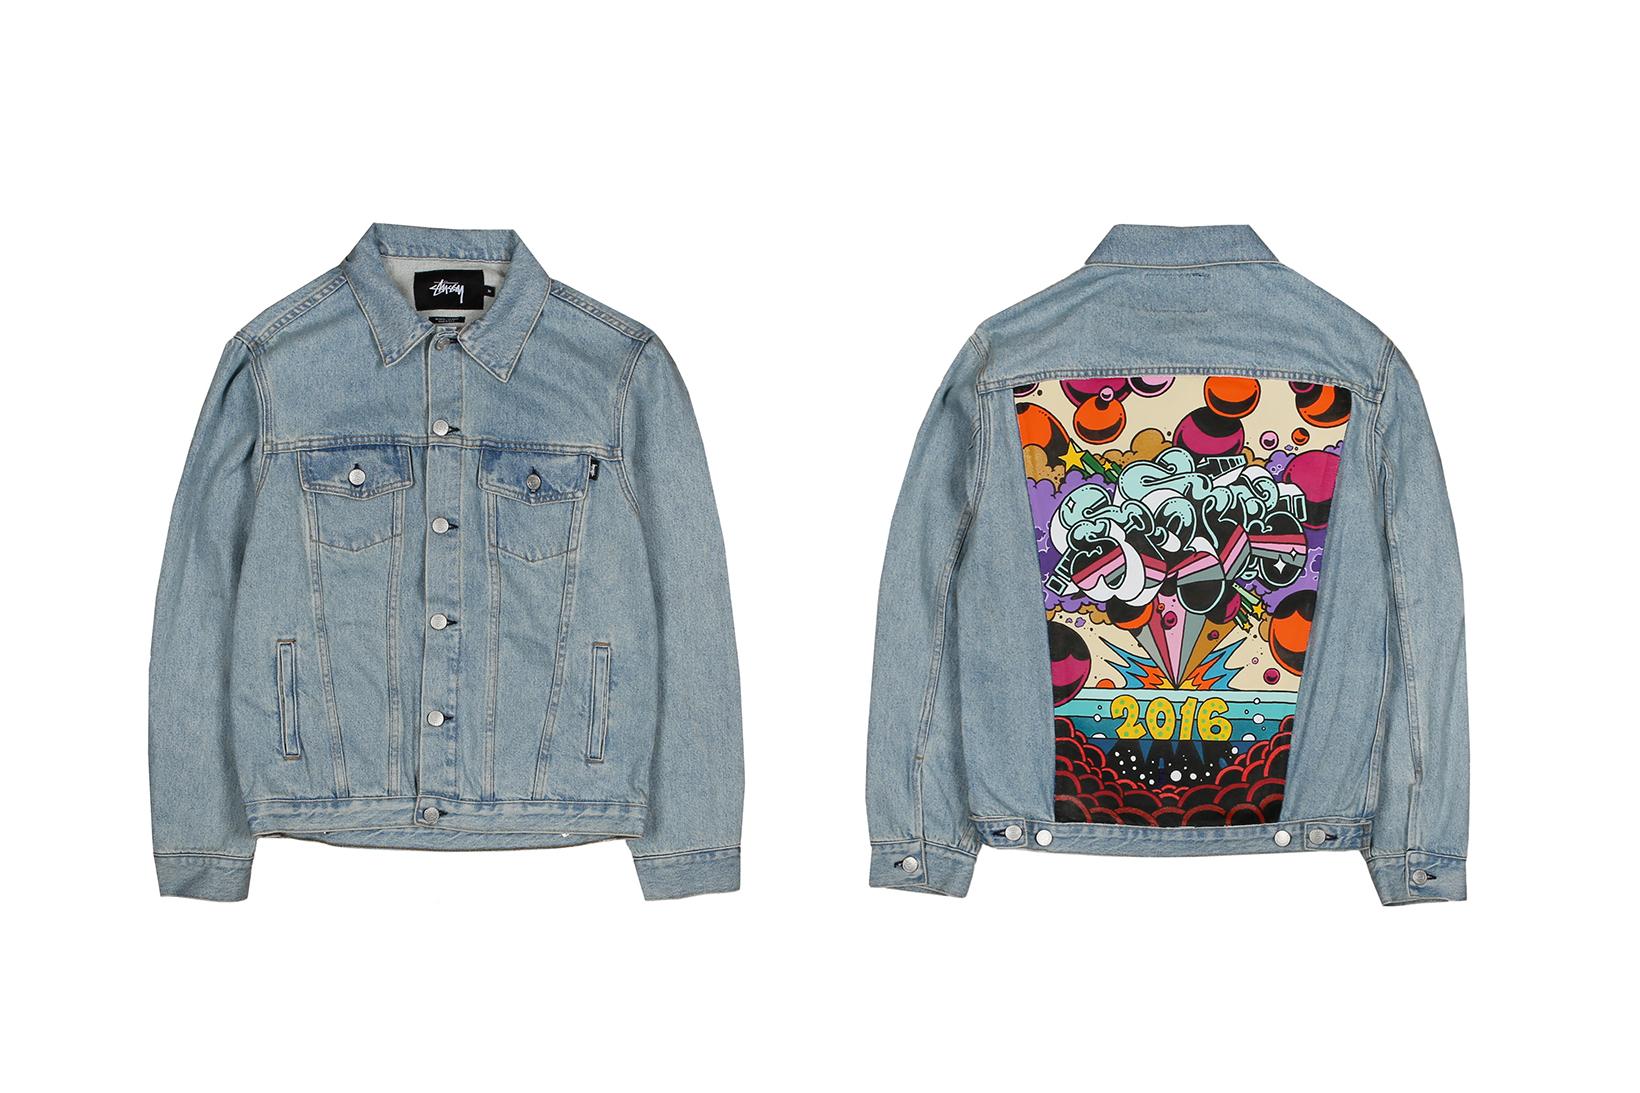 Artists Let Loose on Custom Denim Jackets to Celebrate 10 Years of Bodega